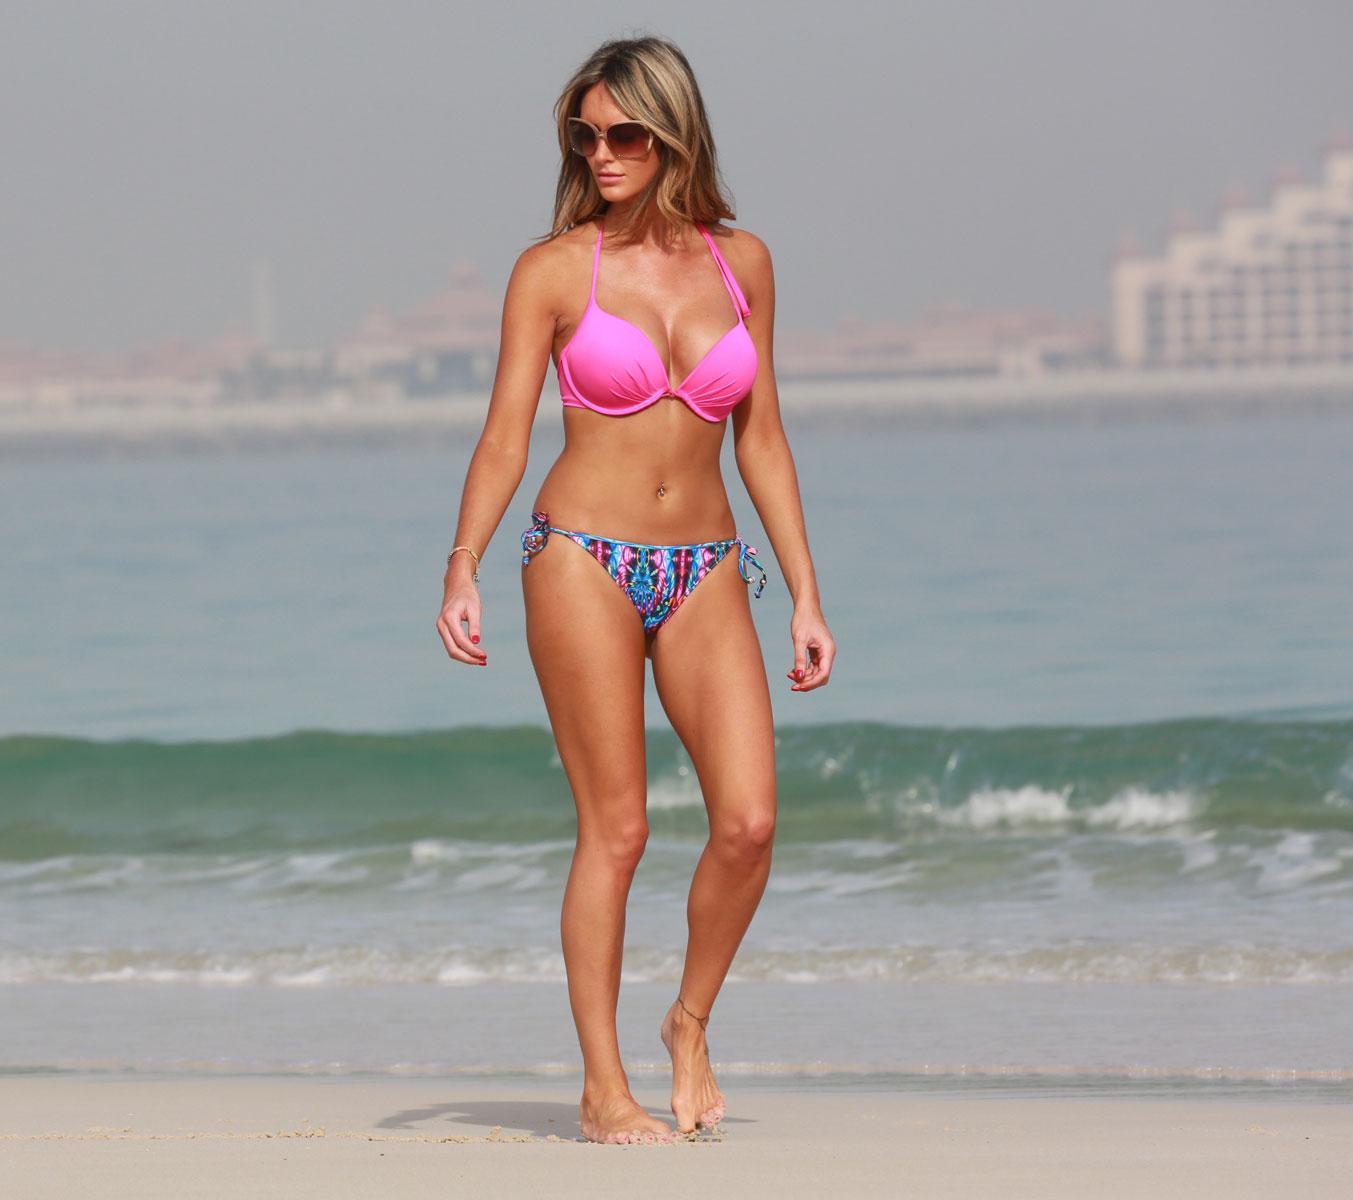 georgina dorsett in bikini on the beach in dubai   hawtcelebs   hawtcelebs